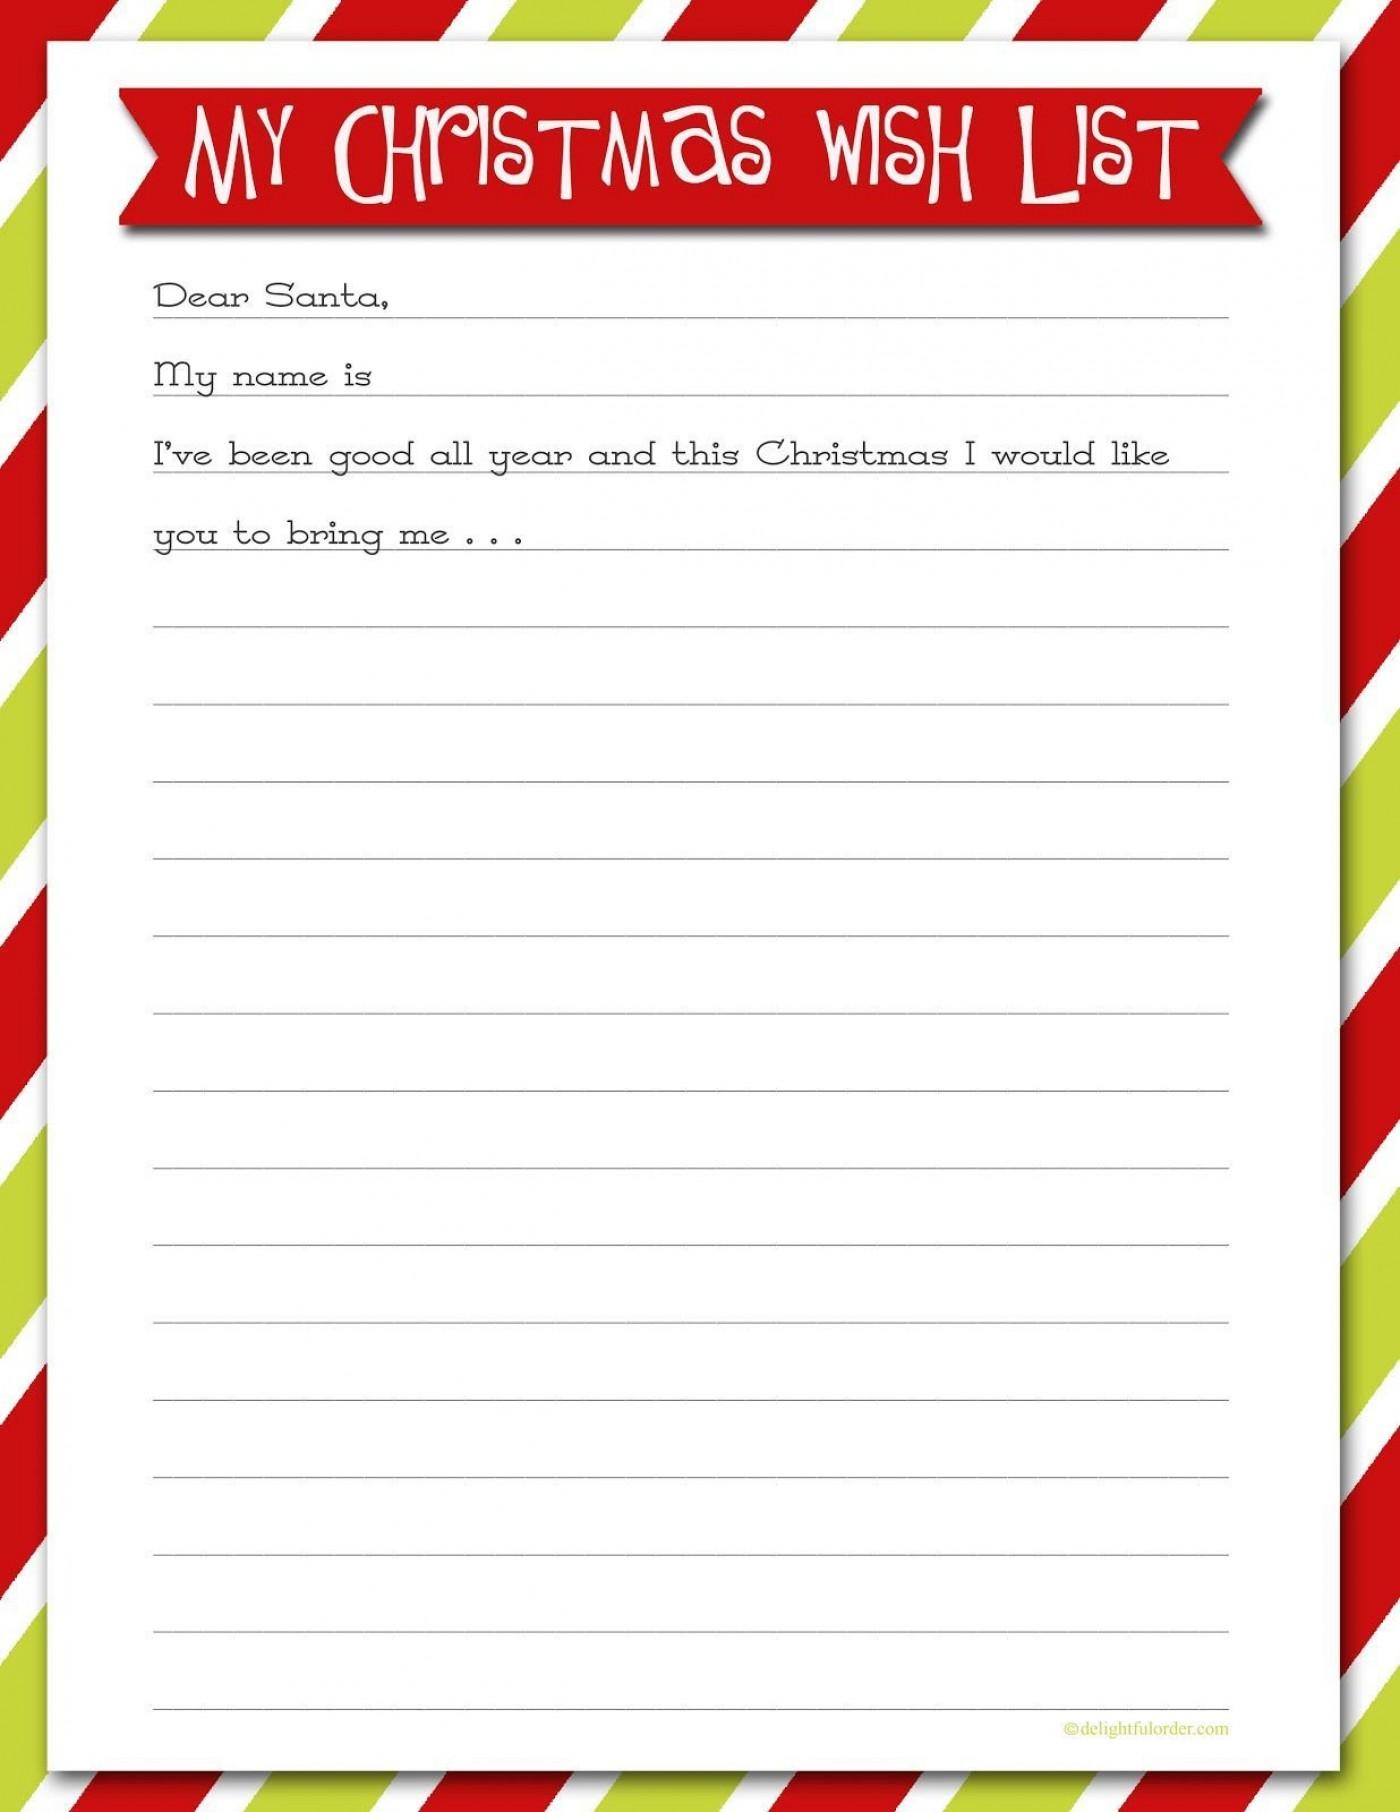 007 Rare Printable Wish List Template High Resolution  Santa Free Secret1400